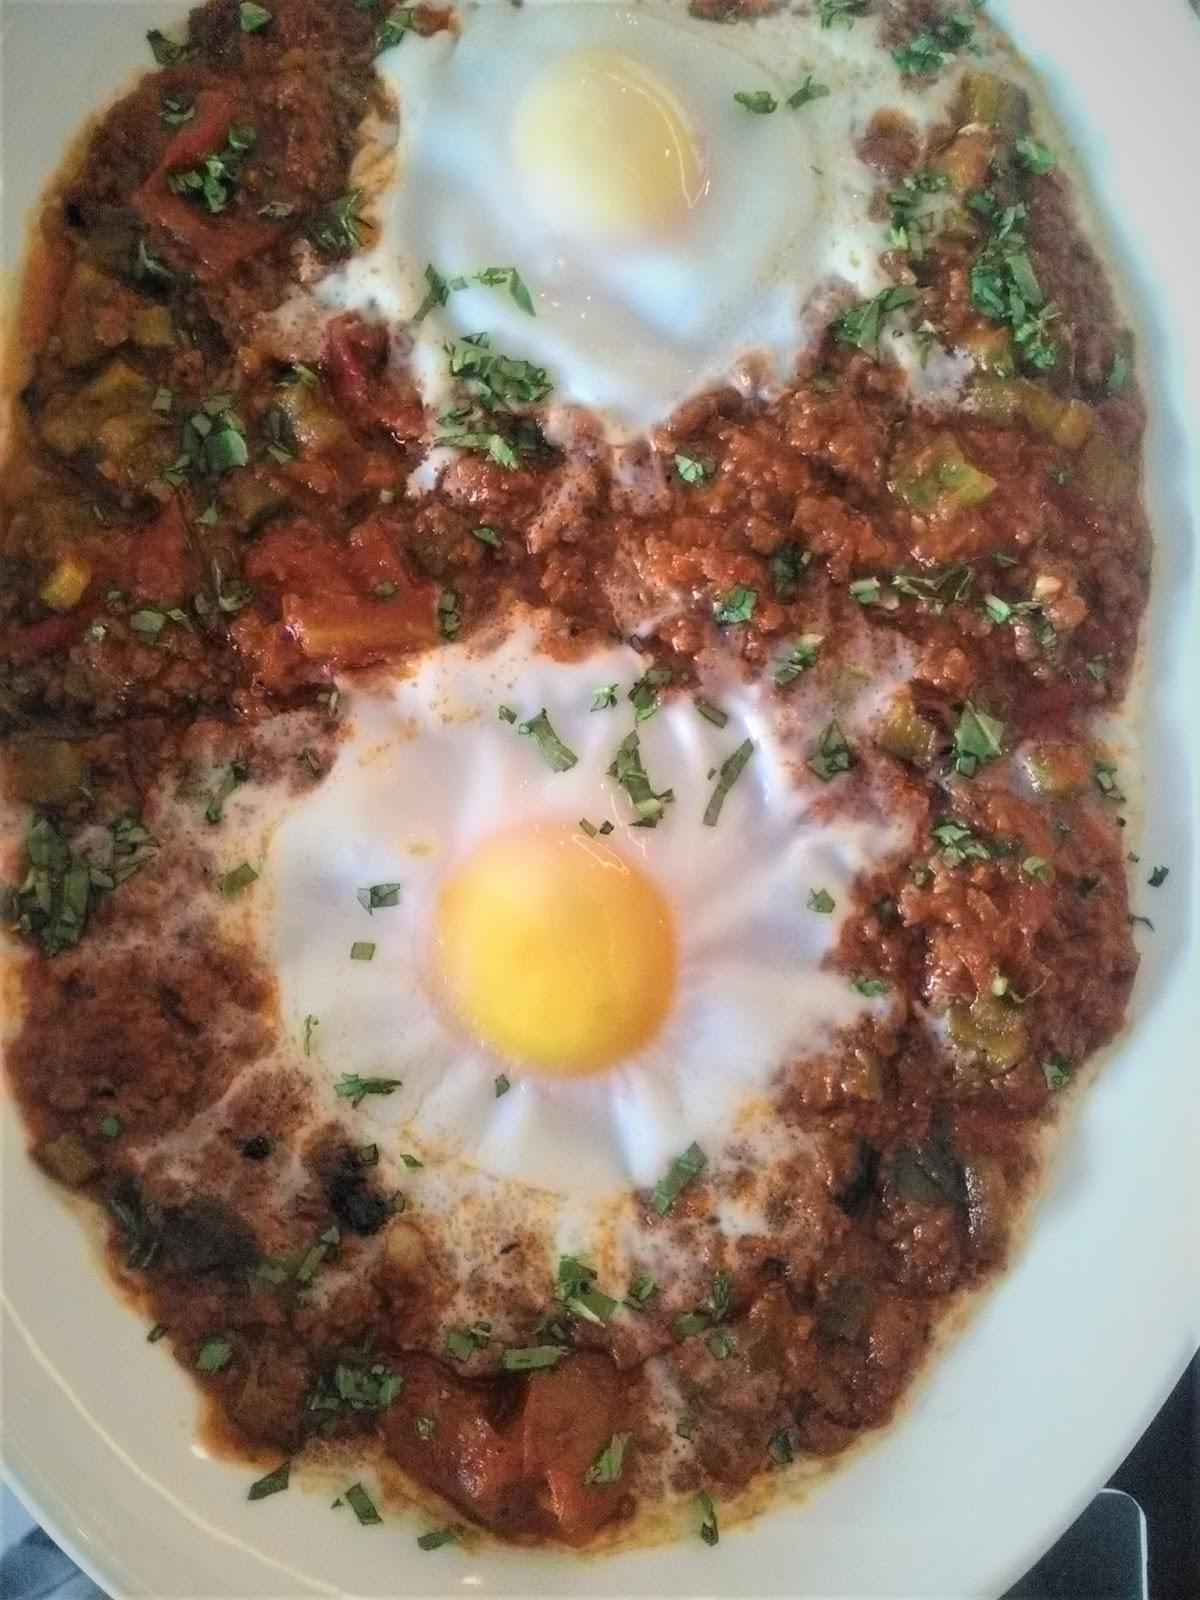 Bukber Dahsyat Innside by Melia